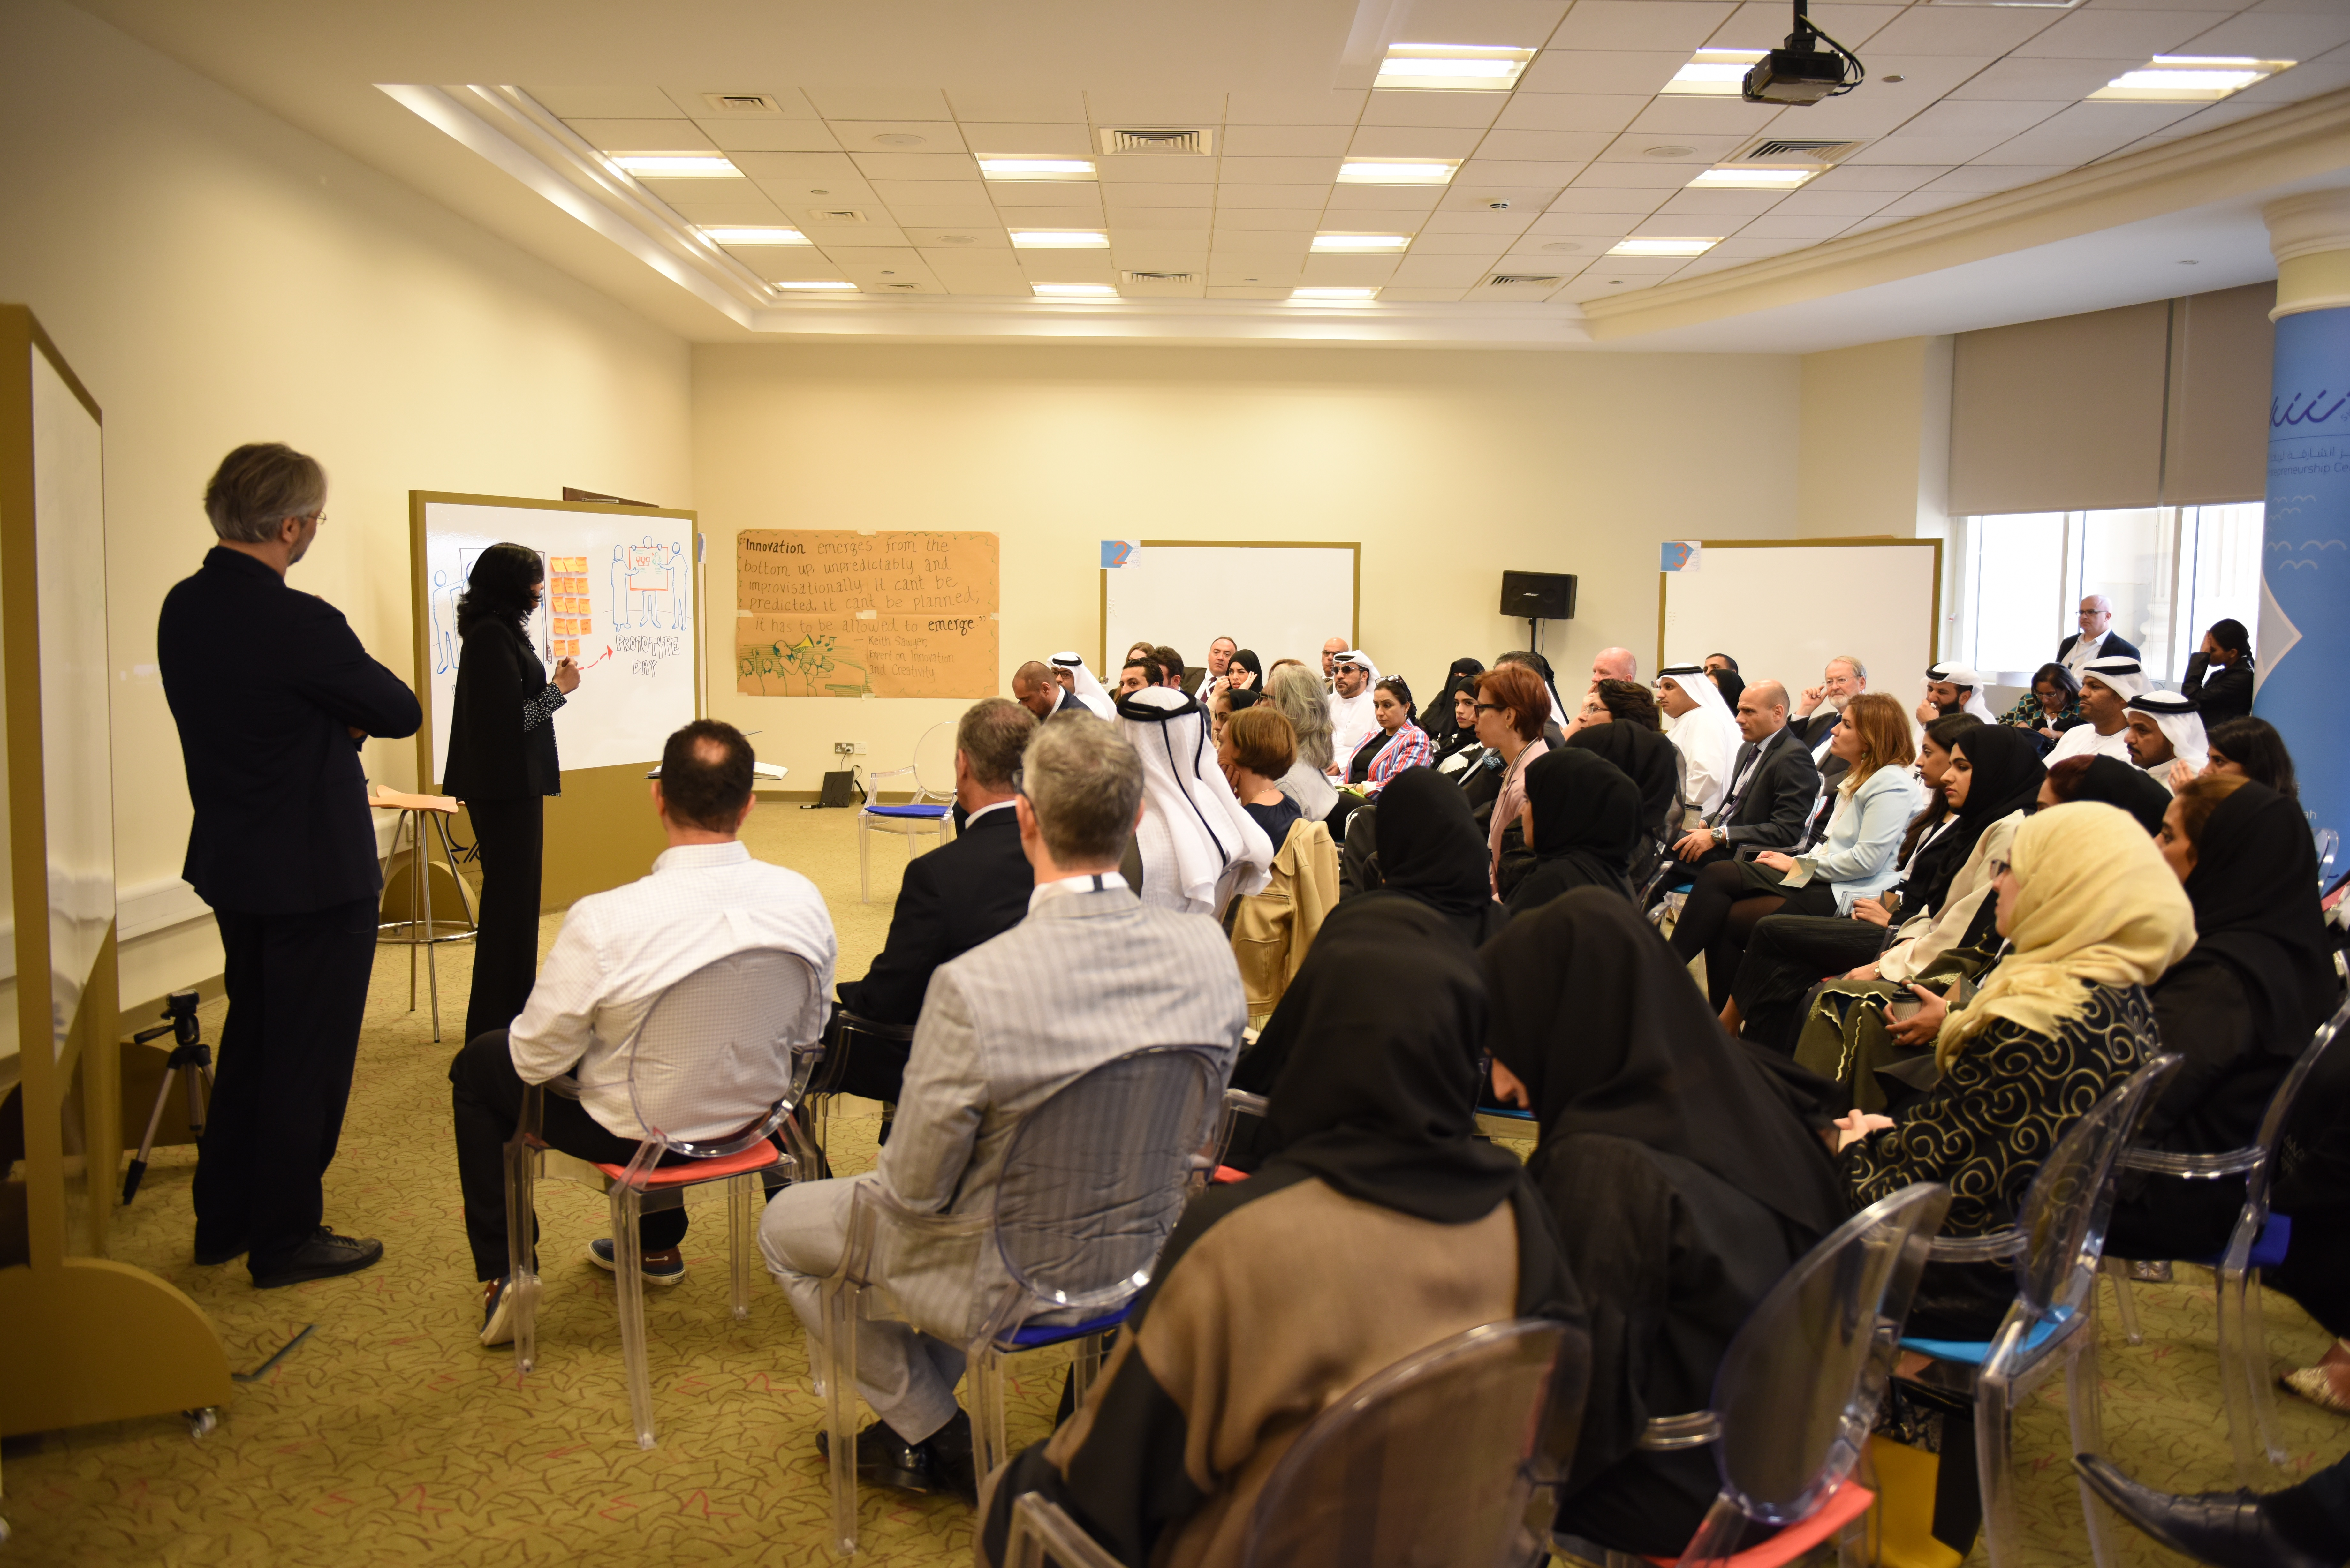 American_University_of_Sharjah_16-1.jpg